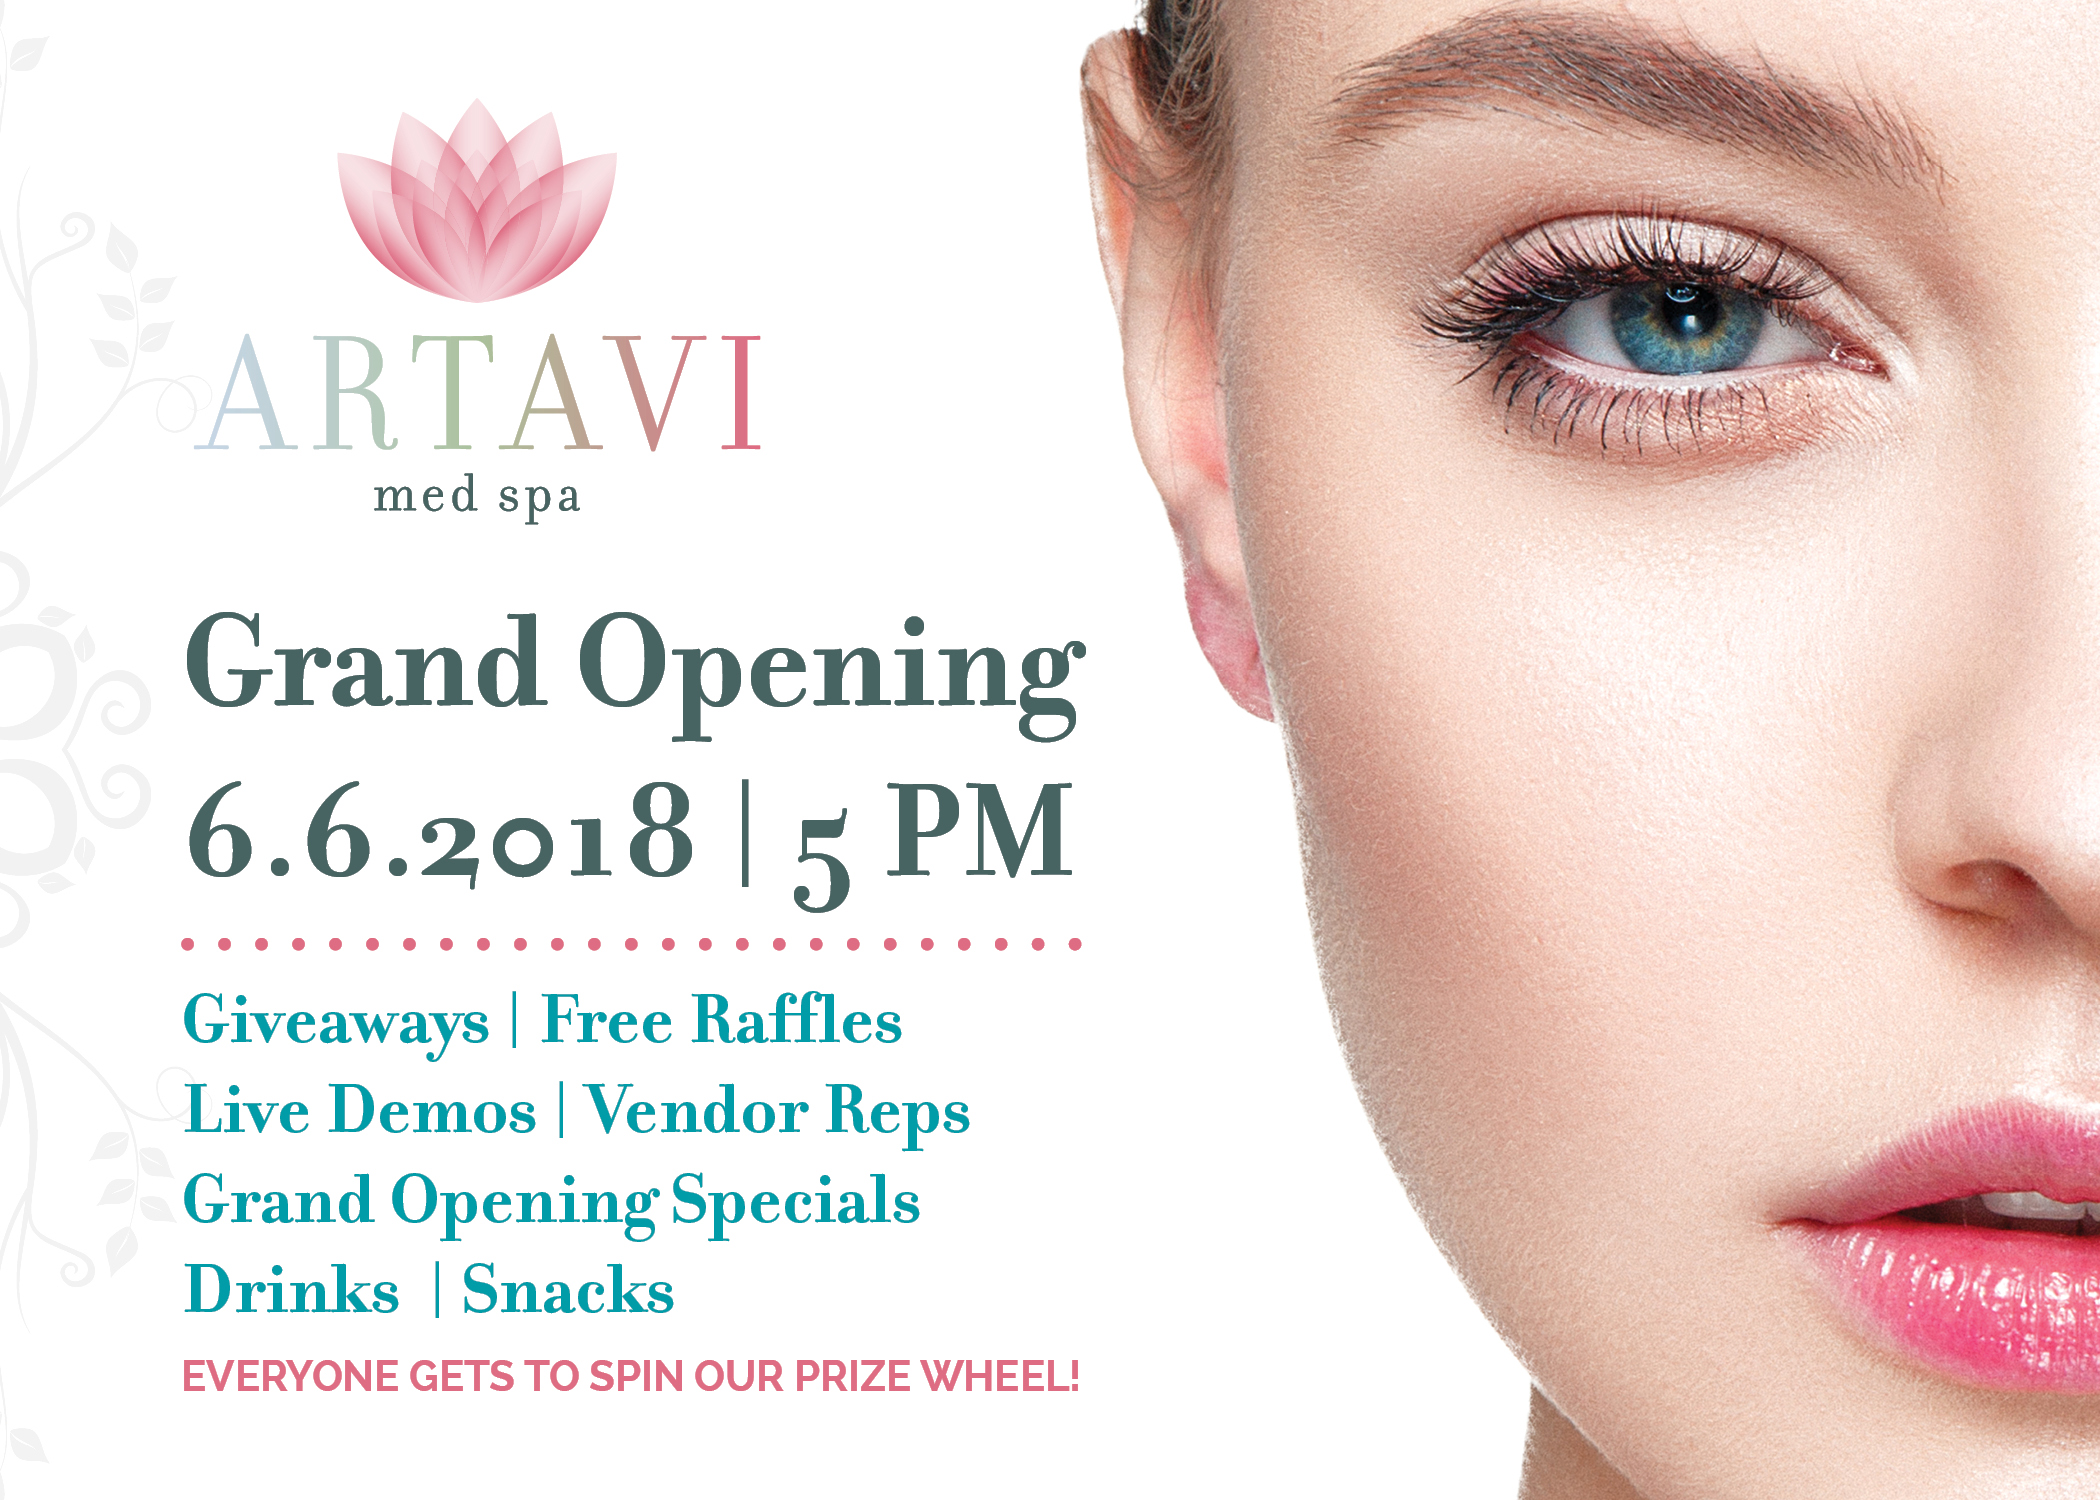 Artavi Grand Opening.jpg